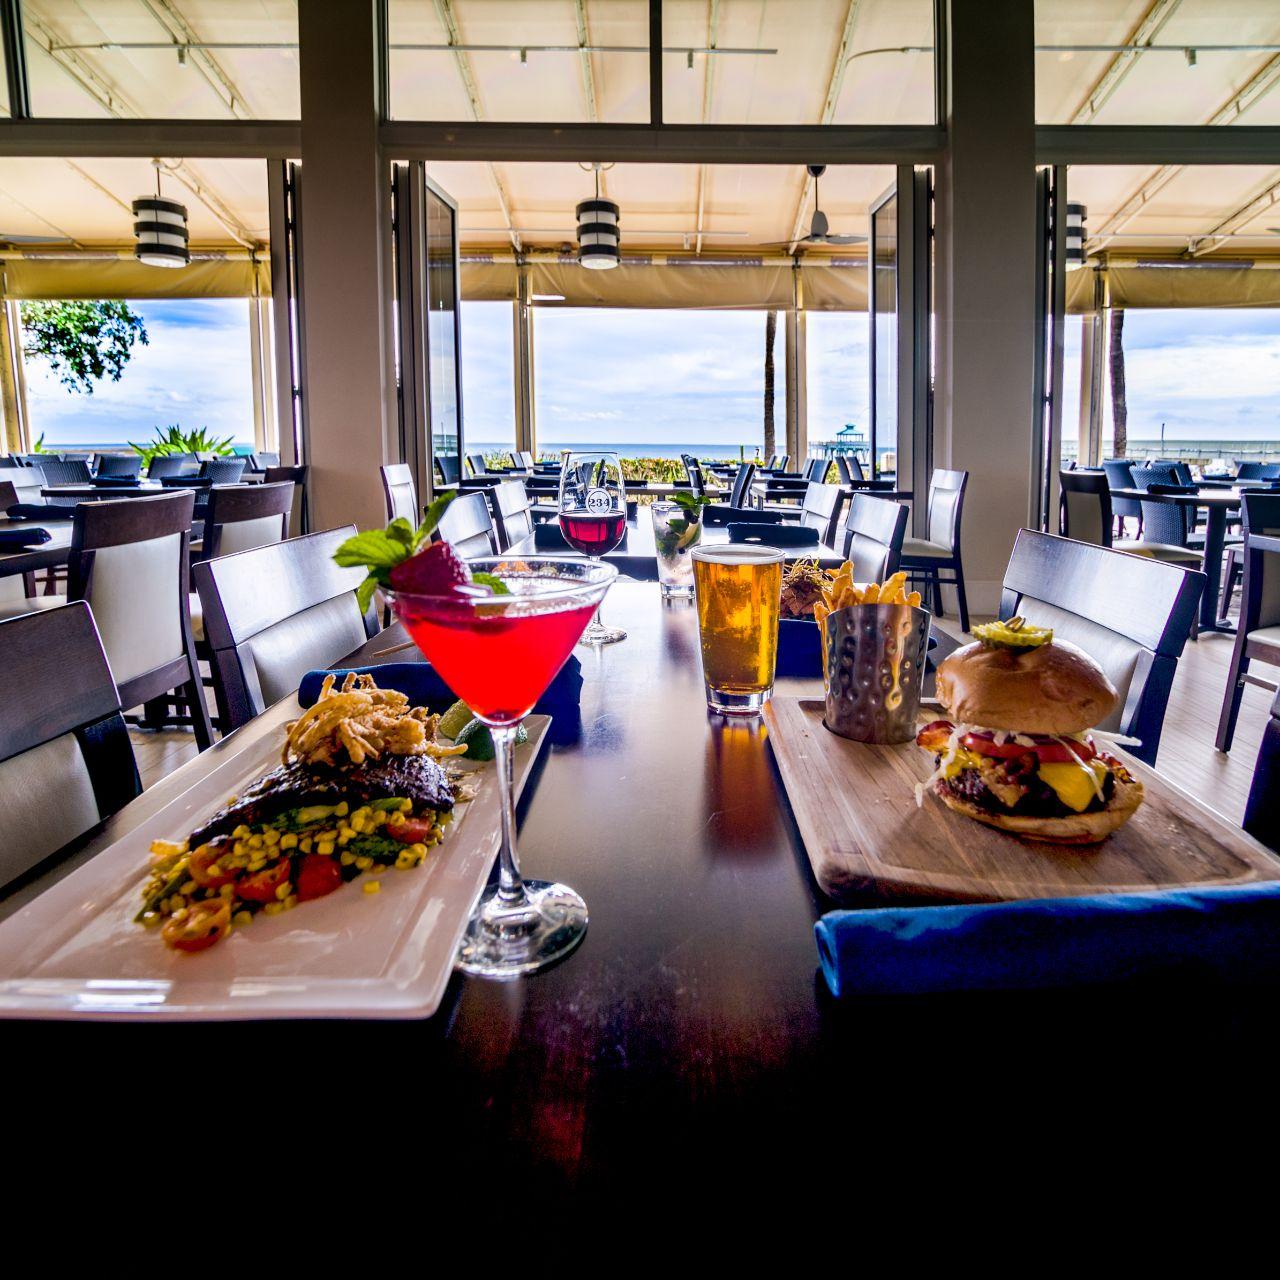 Oceans 234 Restaurant Deerfield Beach